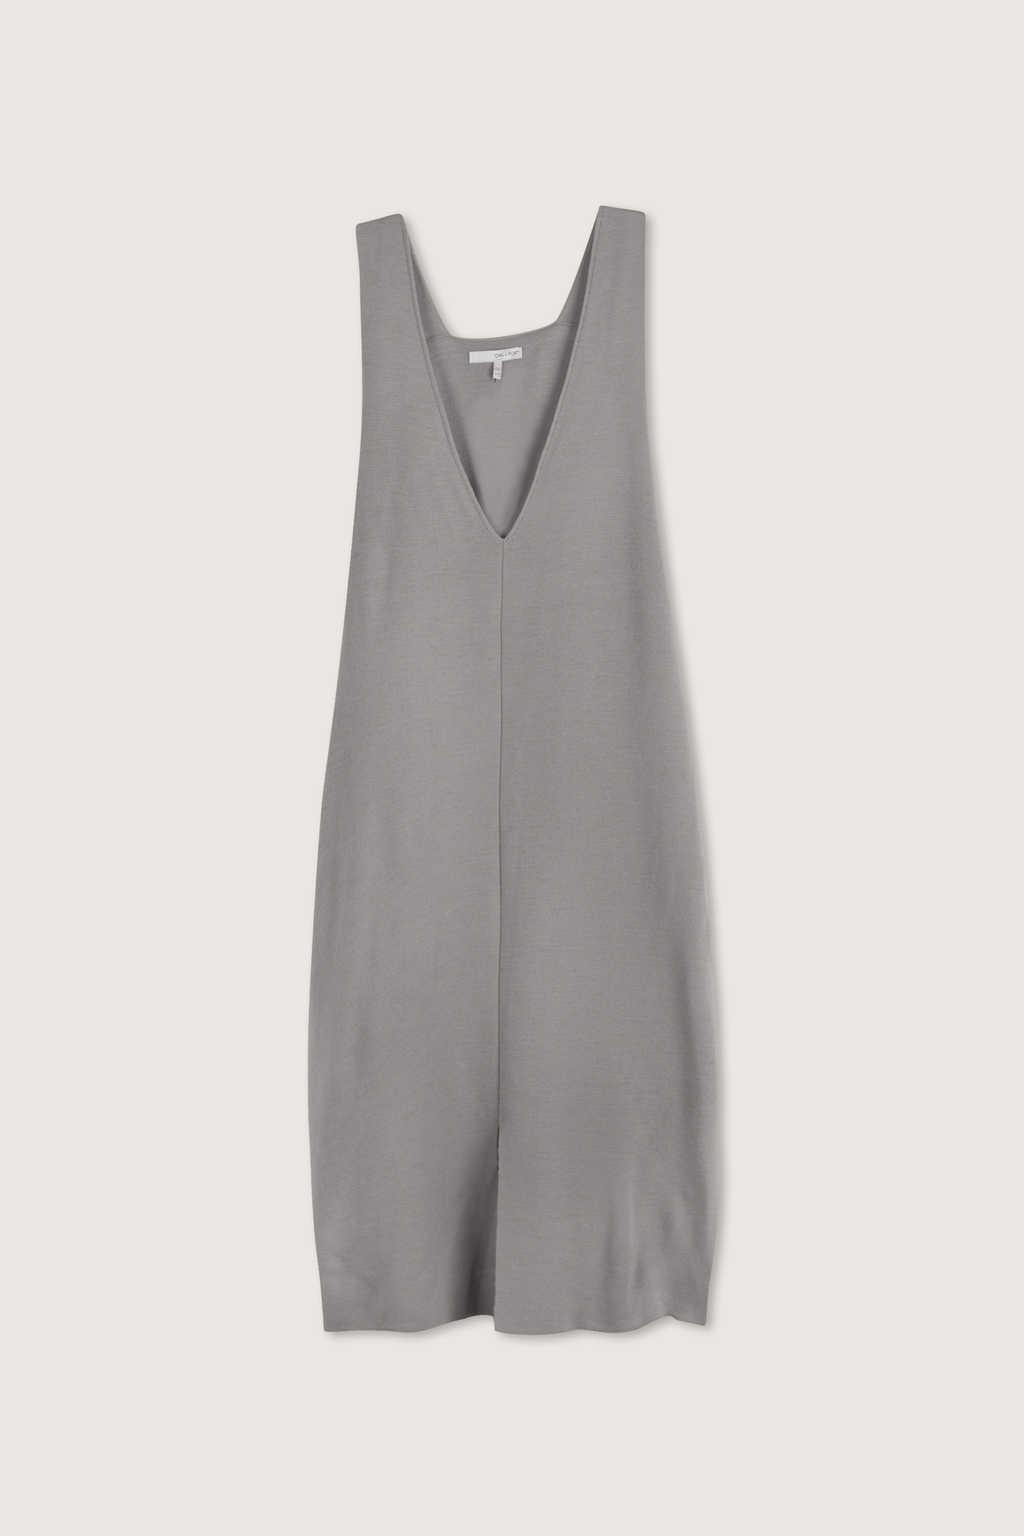 Dress H316 Gray 5